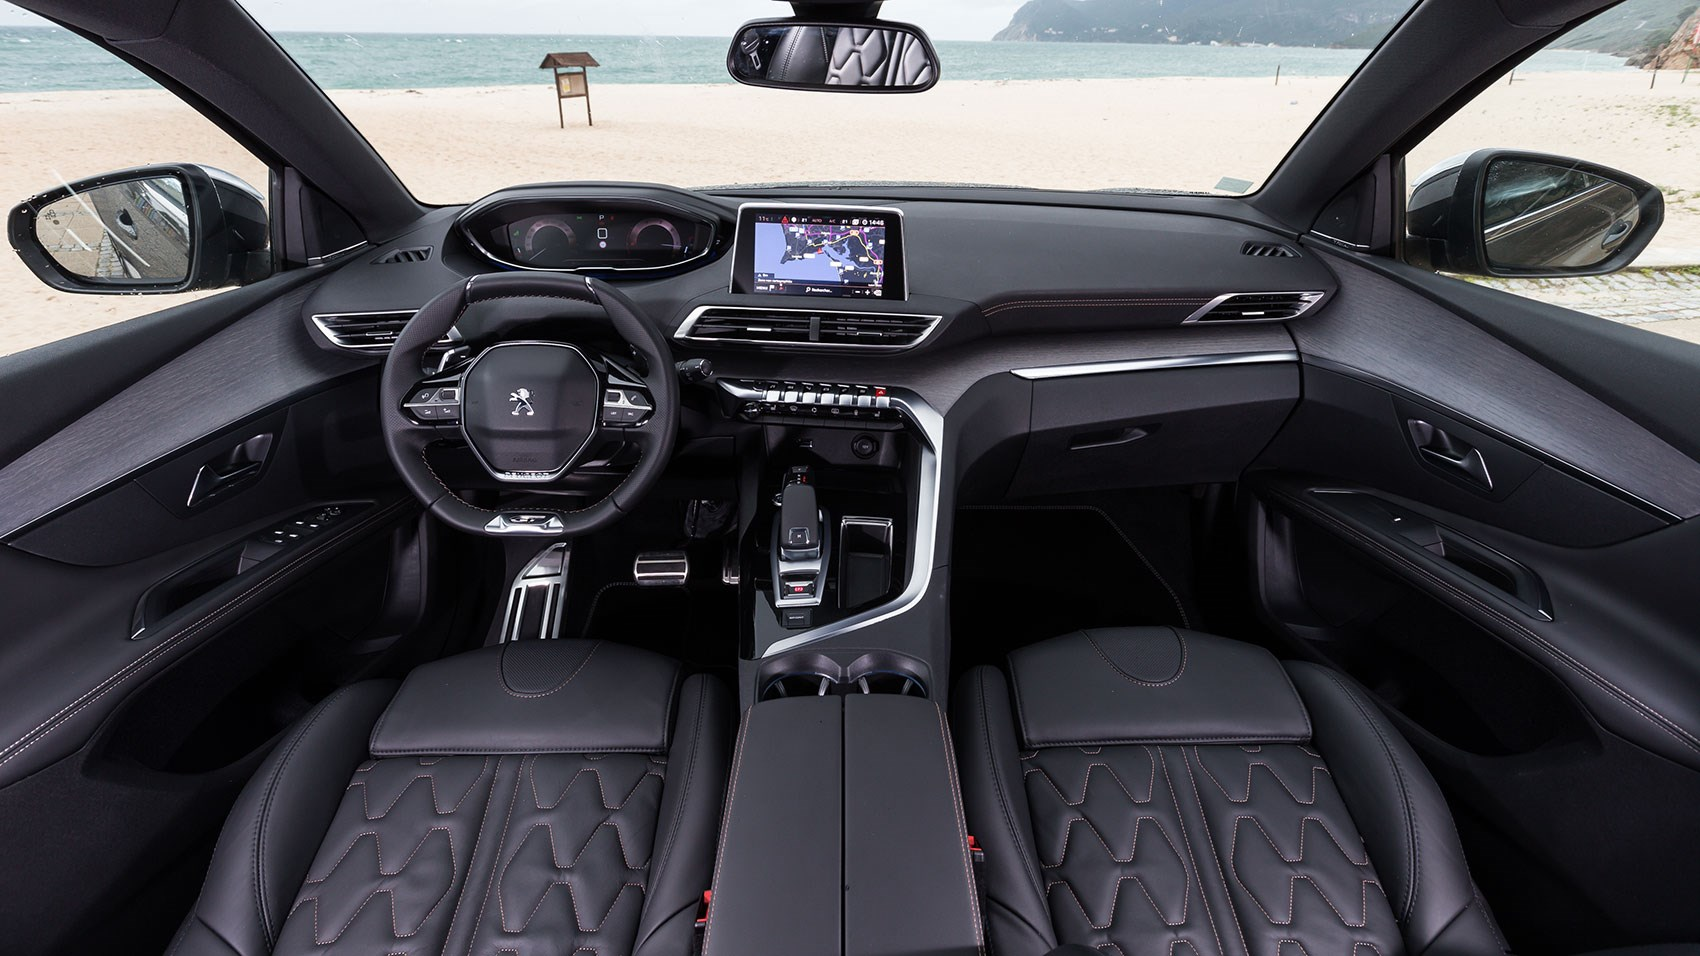 peugeot 5008 2018 review car magazine rh carmagazine co uk Peugeot 5008 Automatic peugeot 5008 user manual english